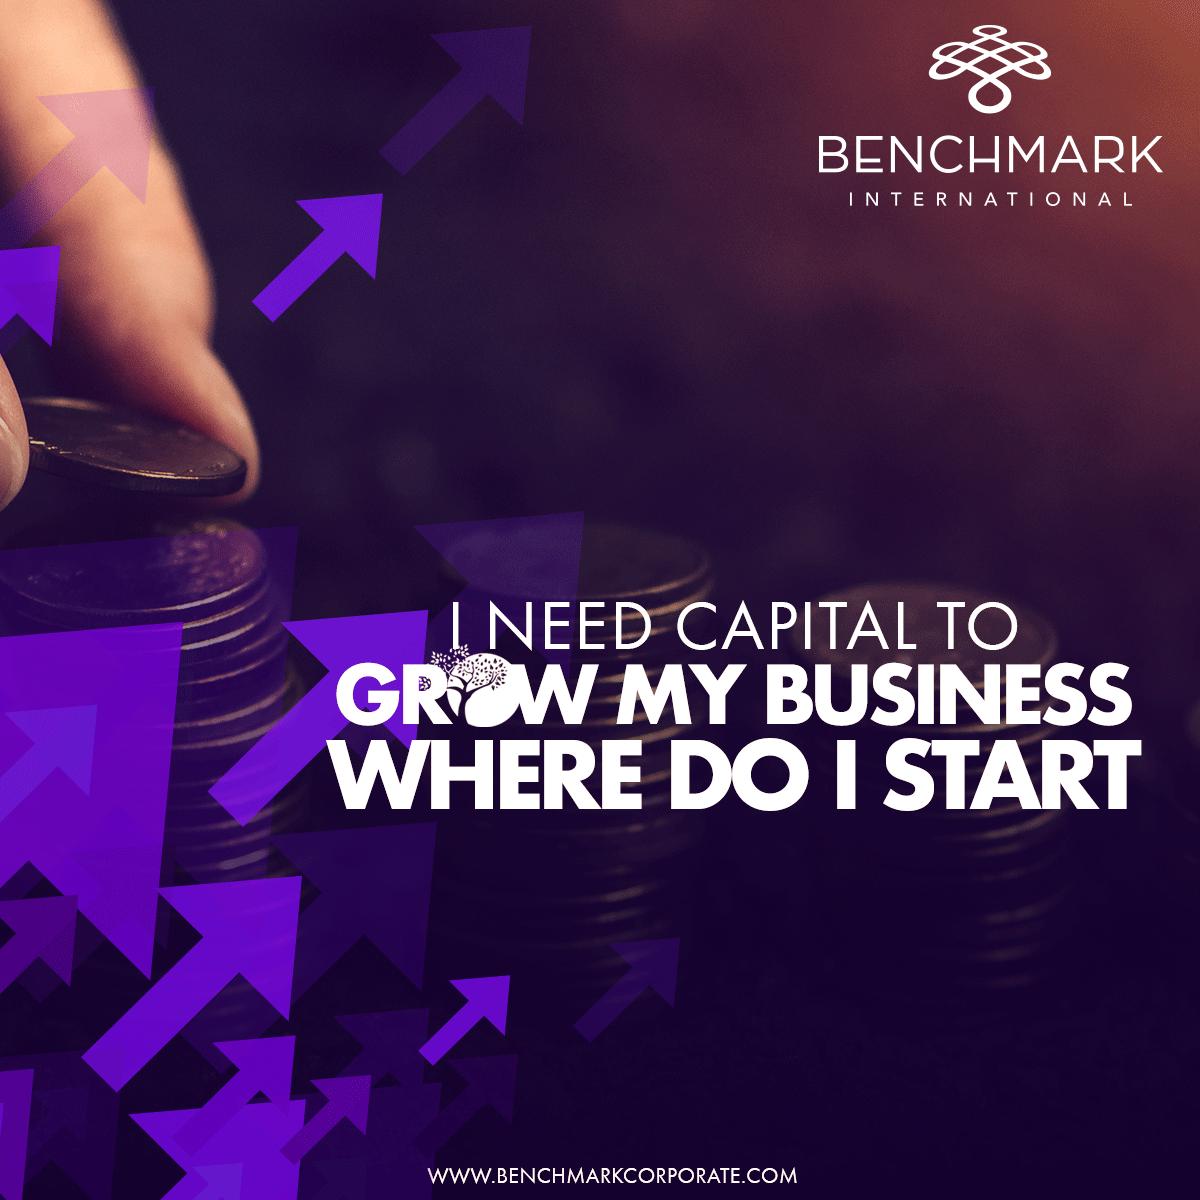 Benchmark-International-Grow-my-Business-Social